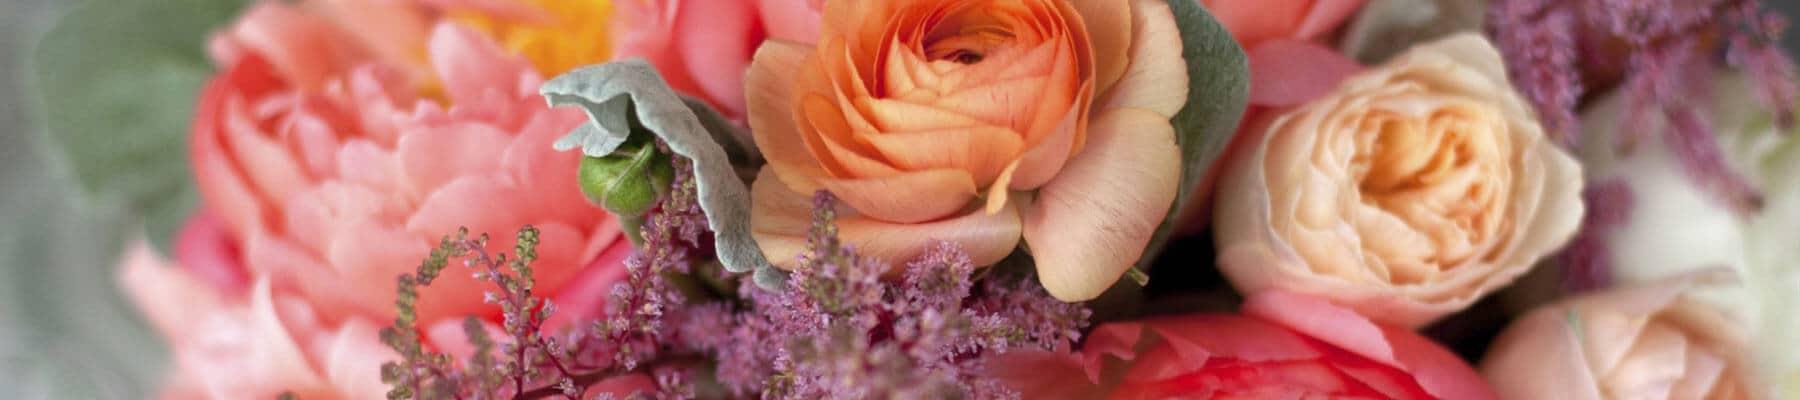 Copper Penny Flowers Concord Florist